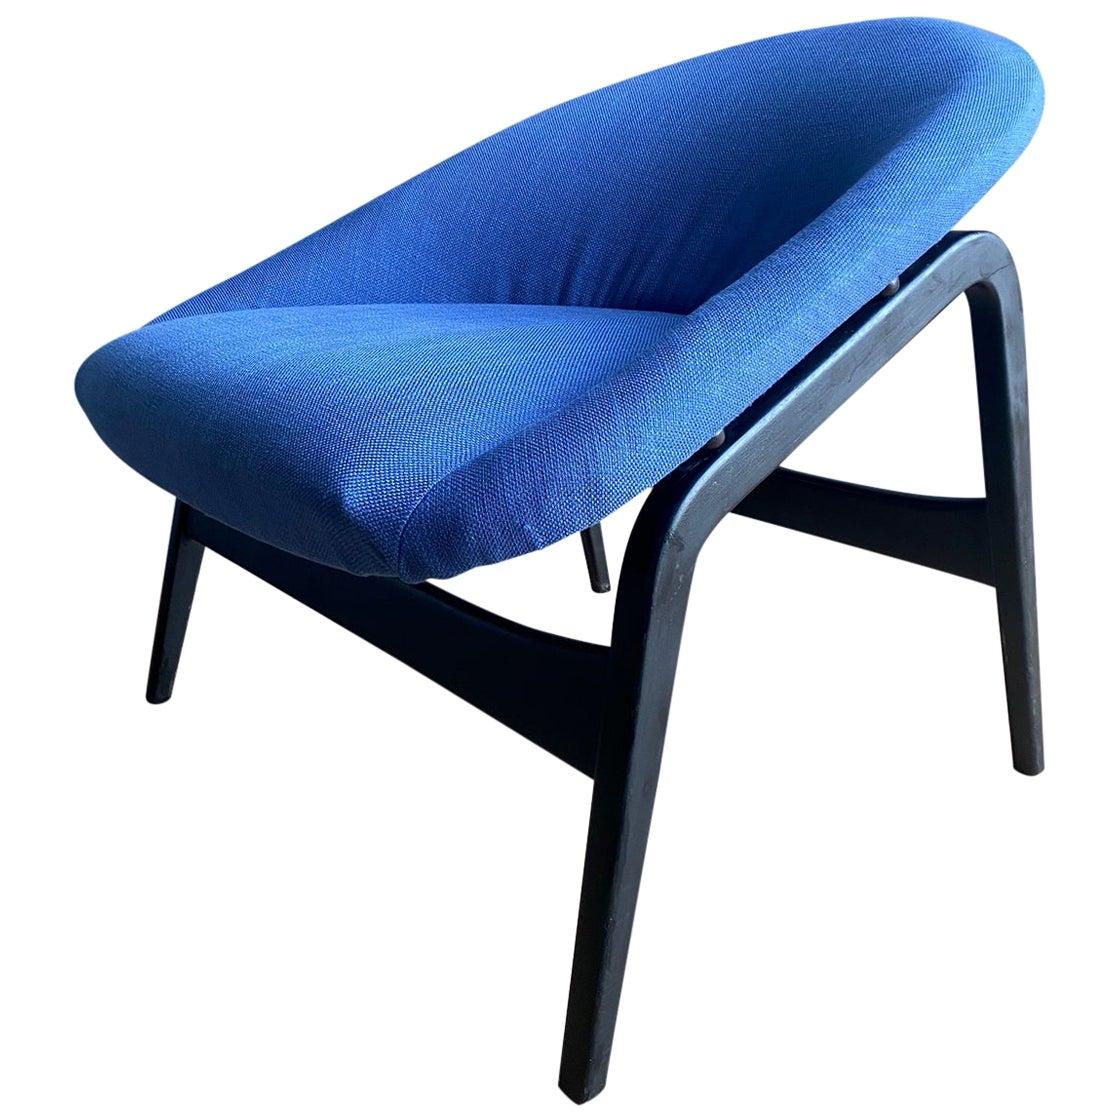 Hartmut Lohmeyer for Artifort, Blue Lounge Chair, Model Columbus, 1950s